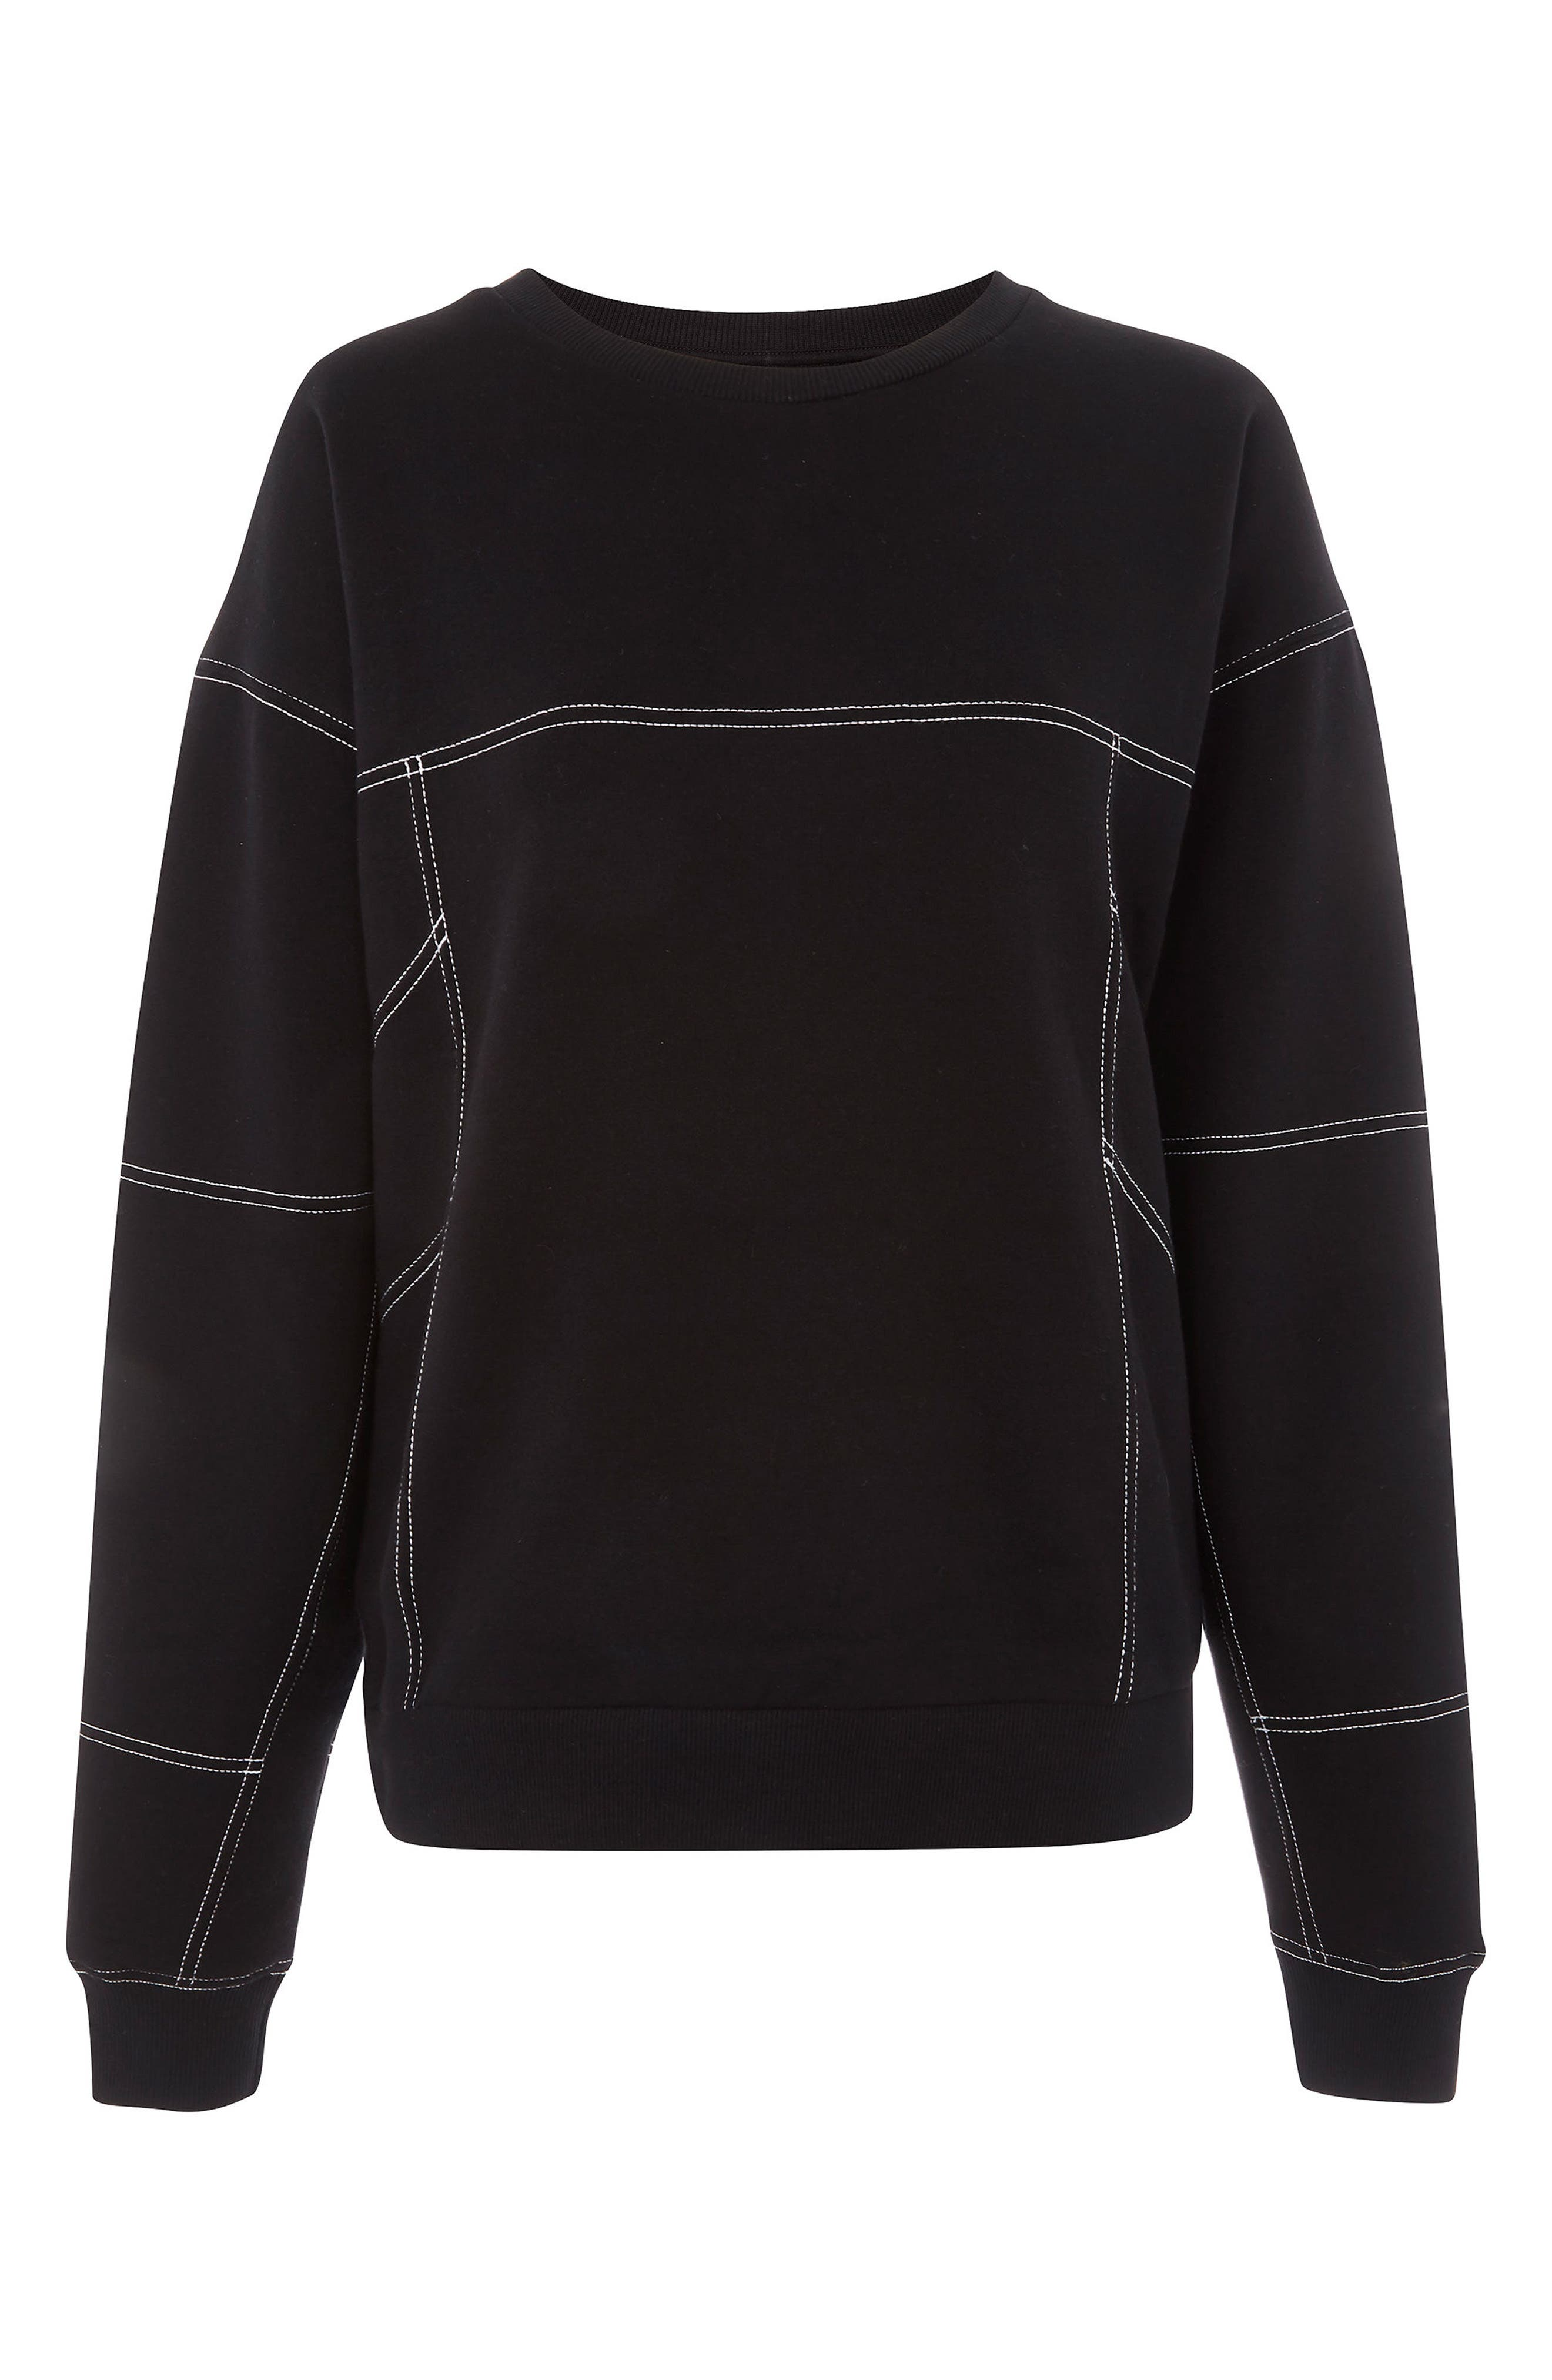 Stab Stitch Detail Sweatshirt,                             Alternate thumbnail 3, color,                             001